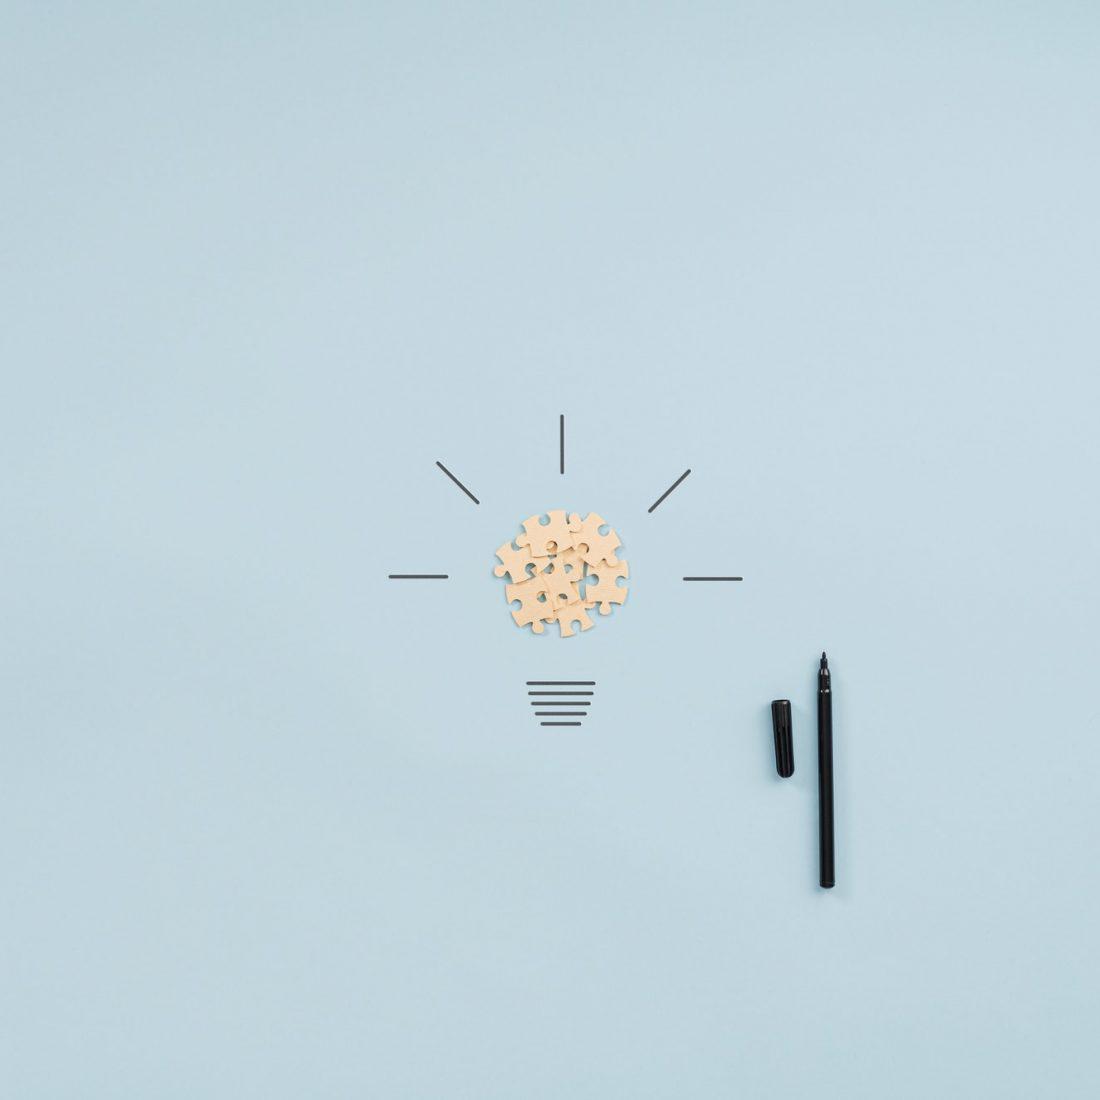 Idea and innovation